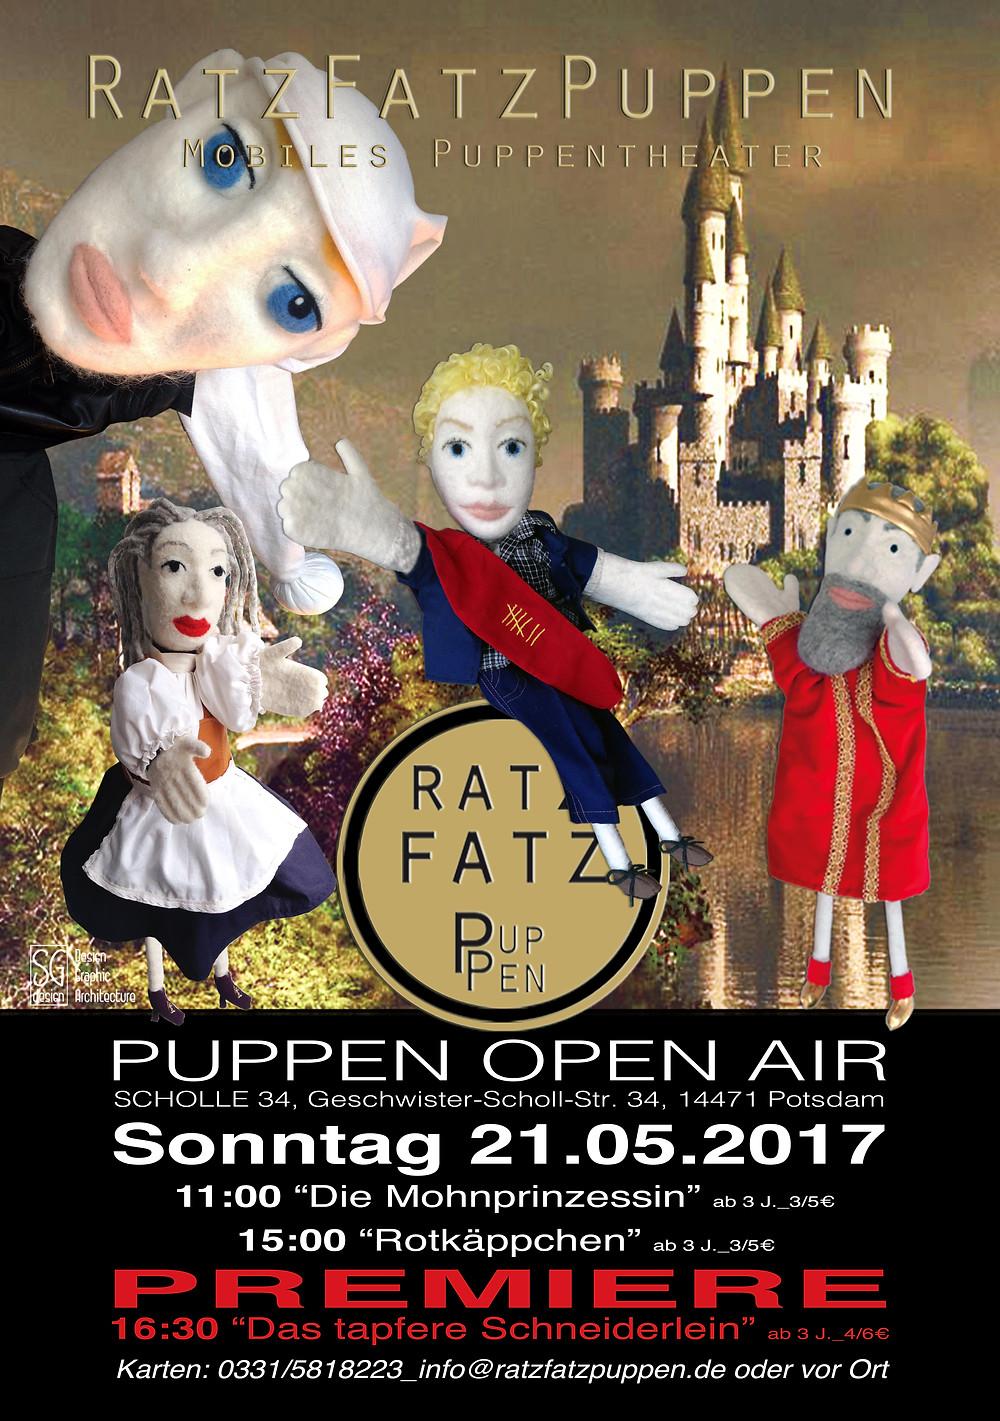 Puppen Open Air, 21.05.2017,  ab 11:00, Scholle 34, 14471 Potsdam